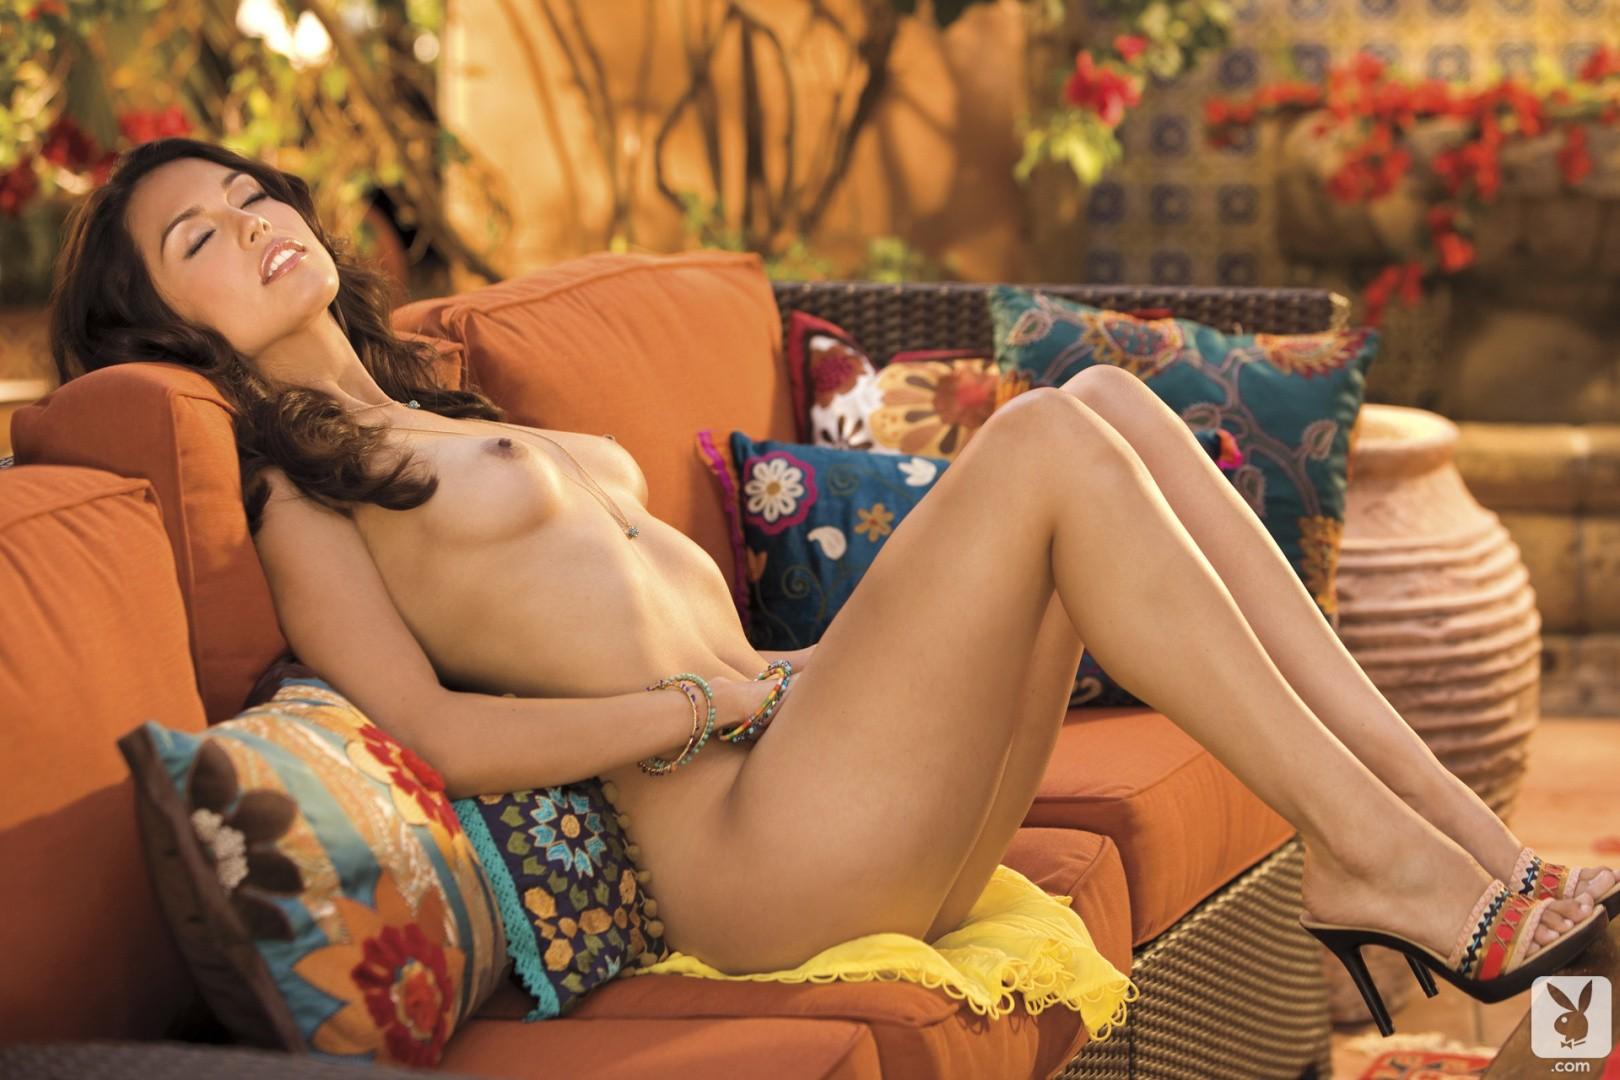 Naked pictures of raquel gomez — photo 11